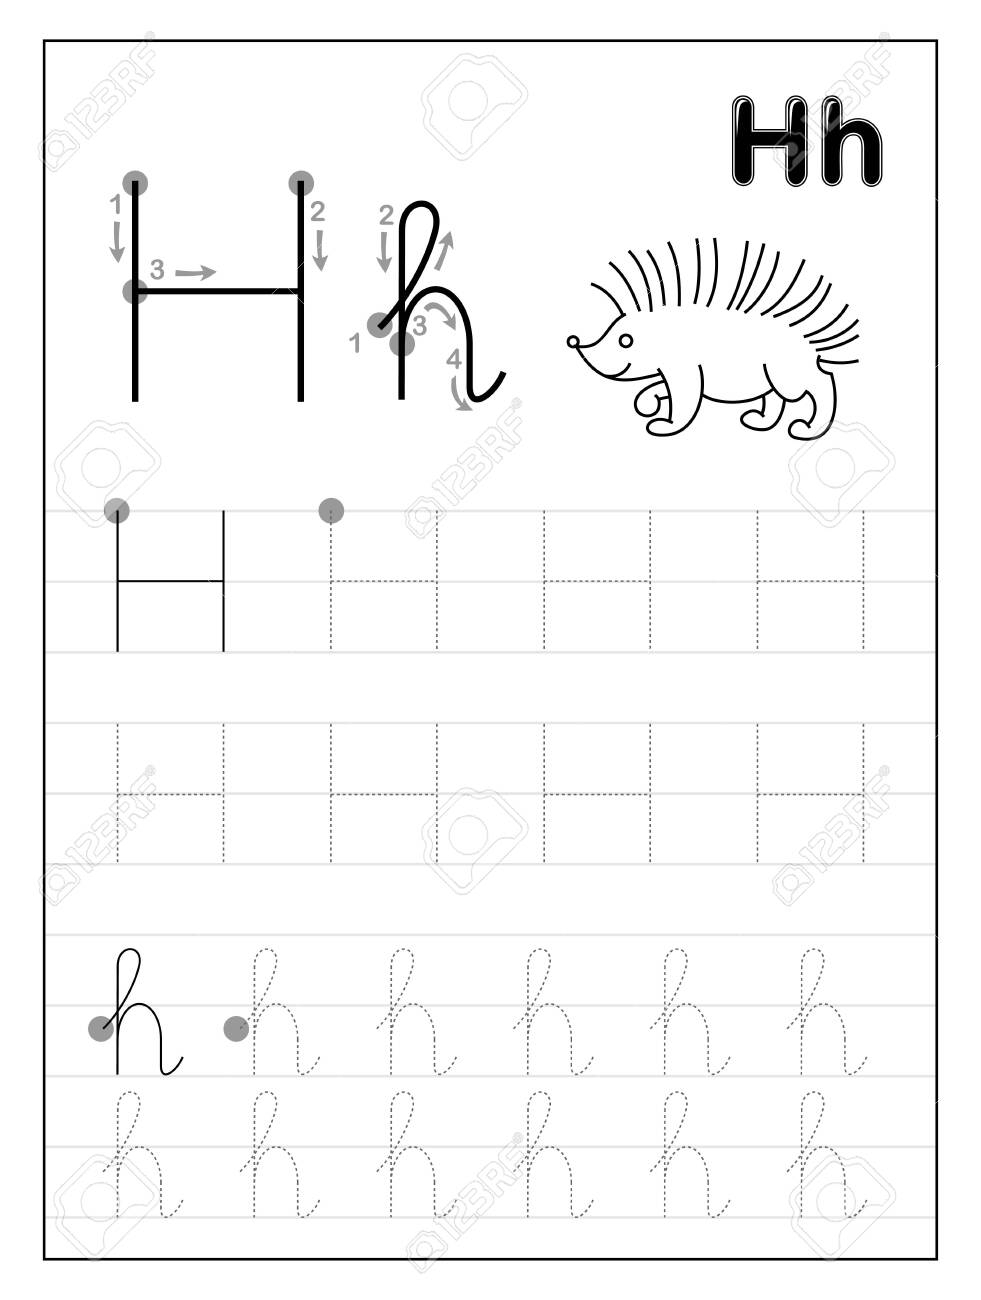 Worksheet ~ Alphabet Writerksheet Tracing Letter H Black And for Letter H Tracing Sheet